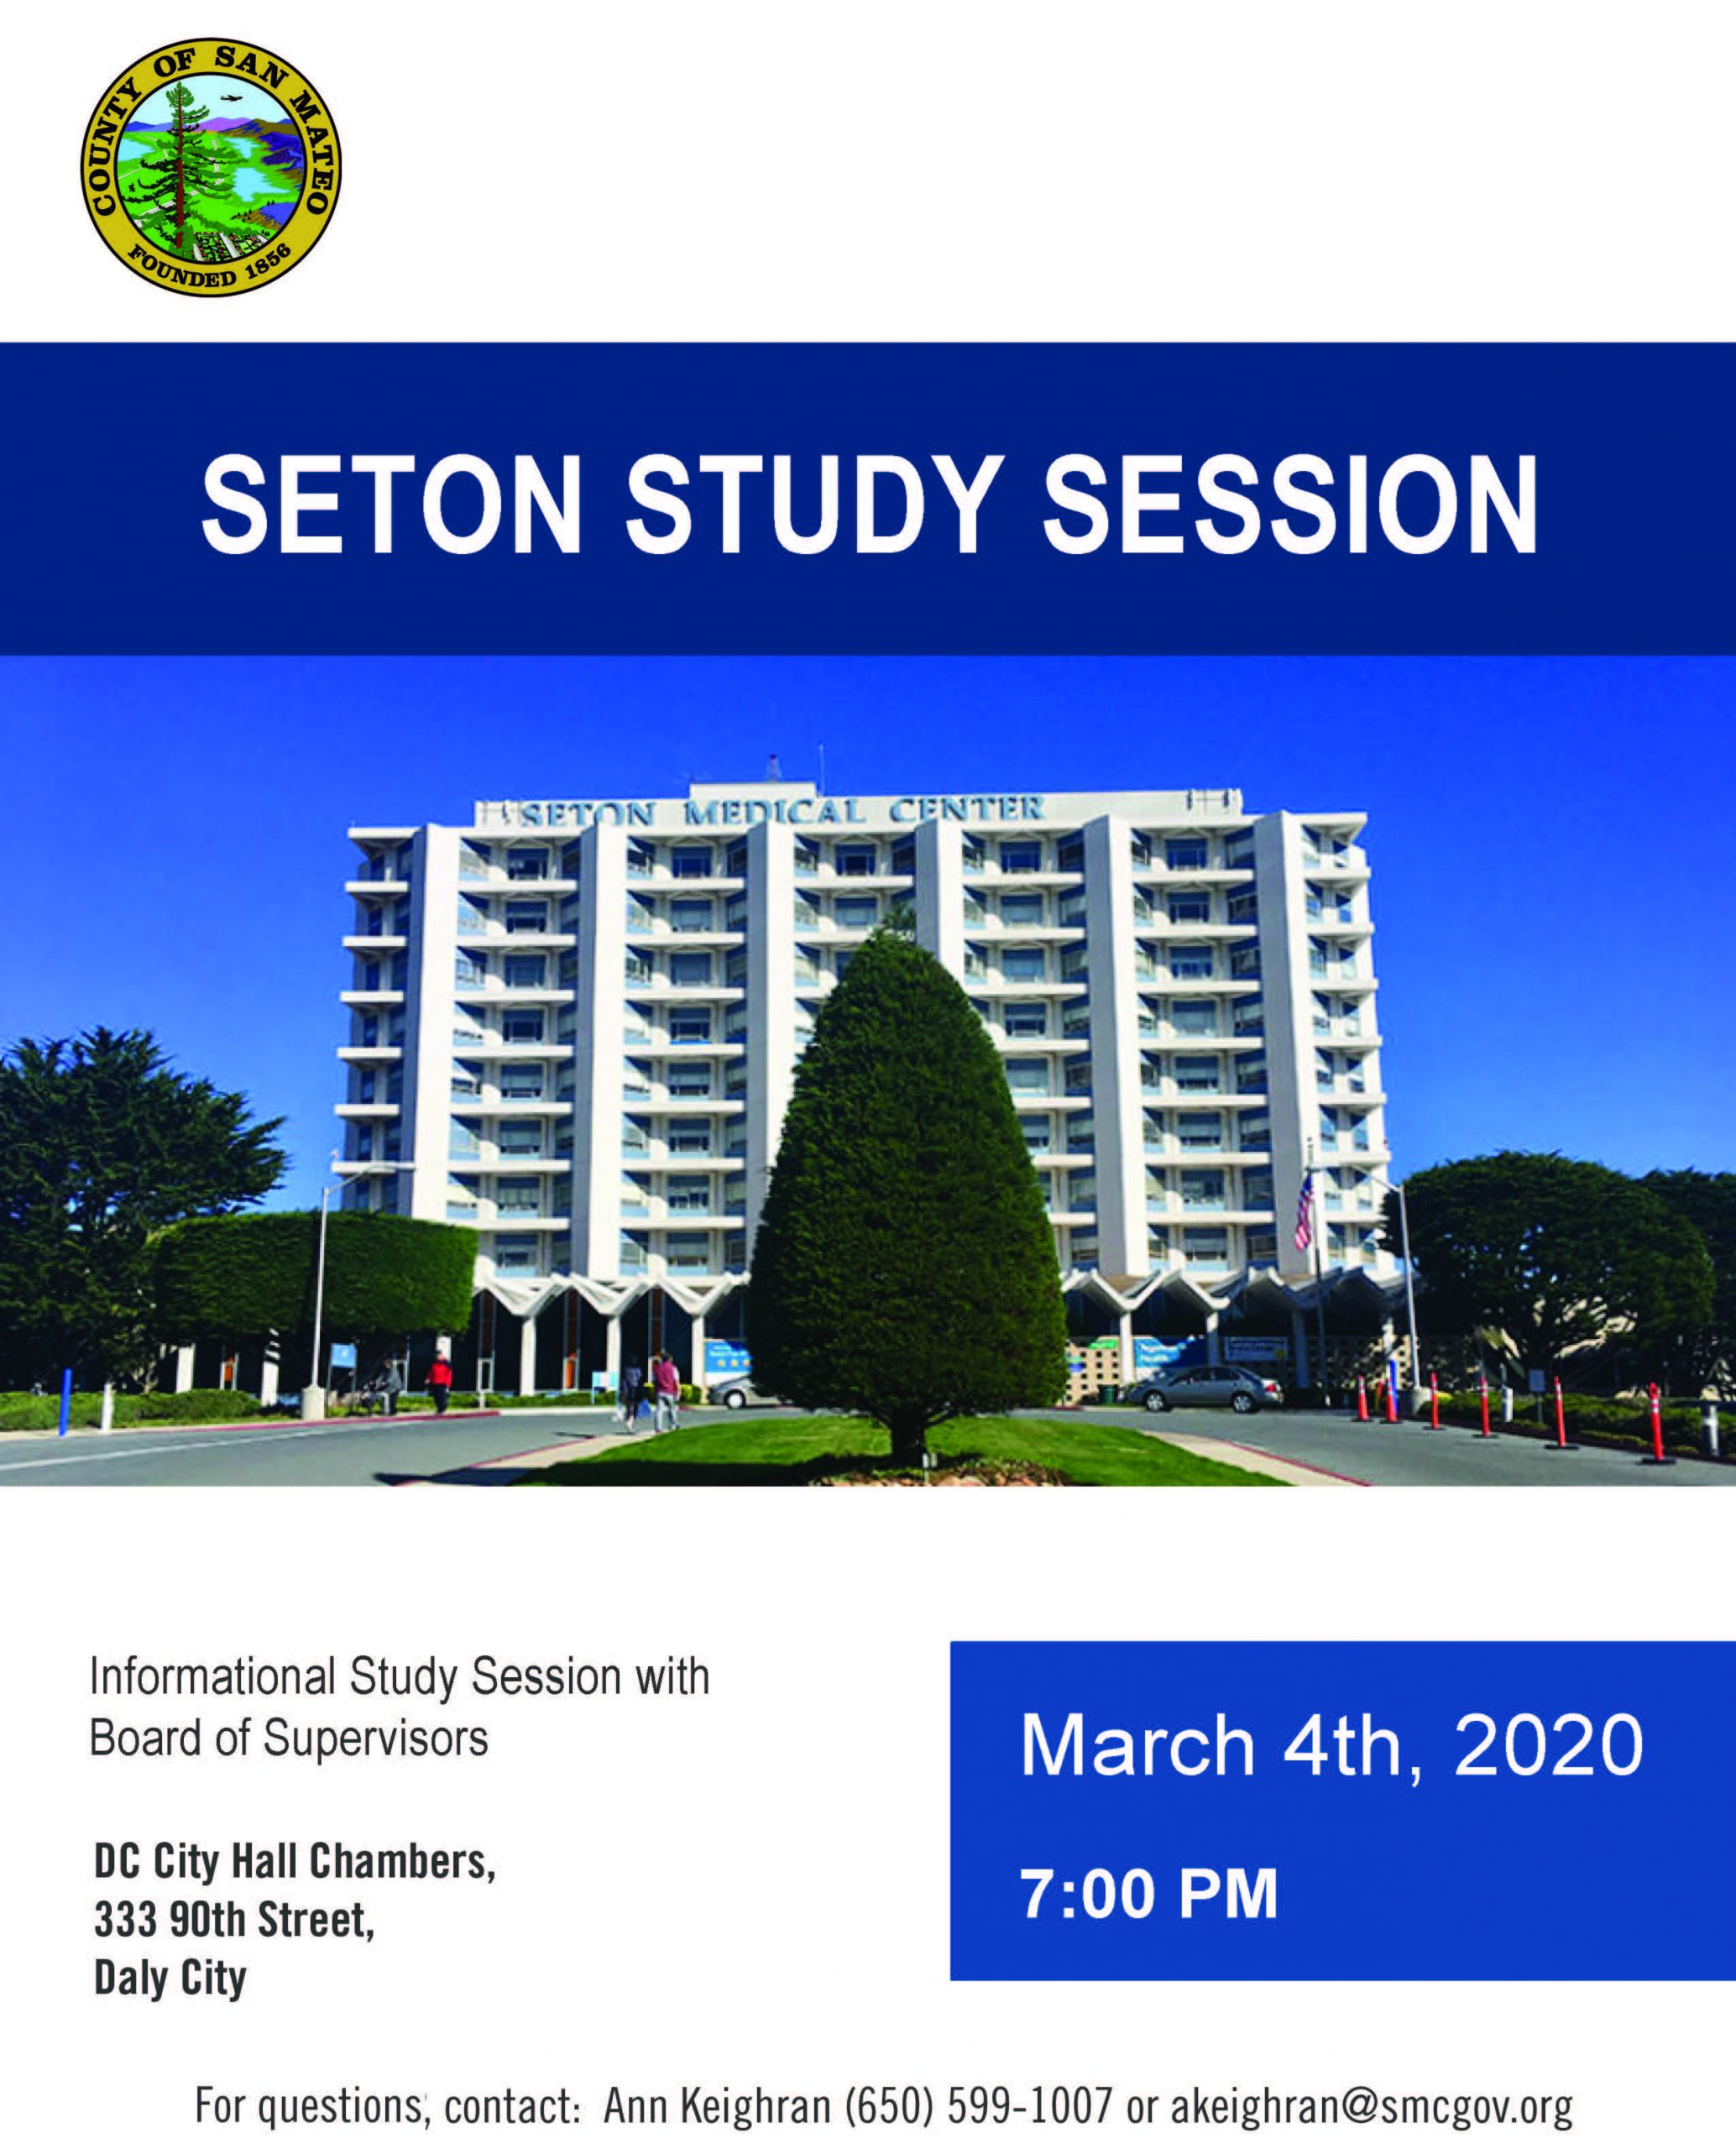 seton study session flyer